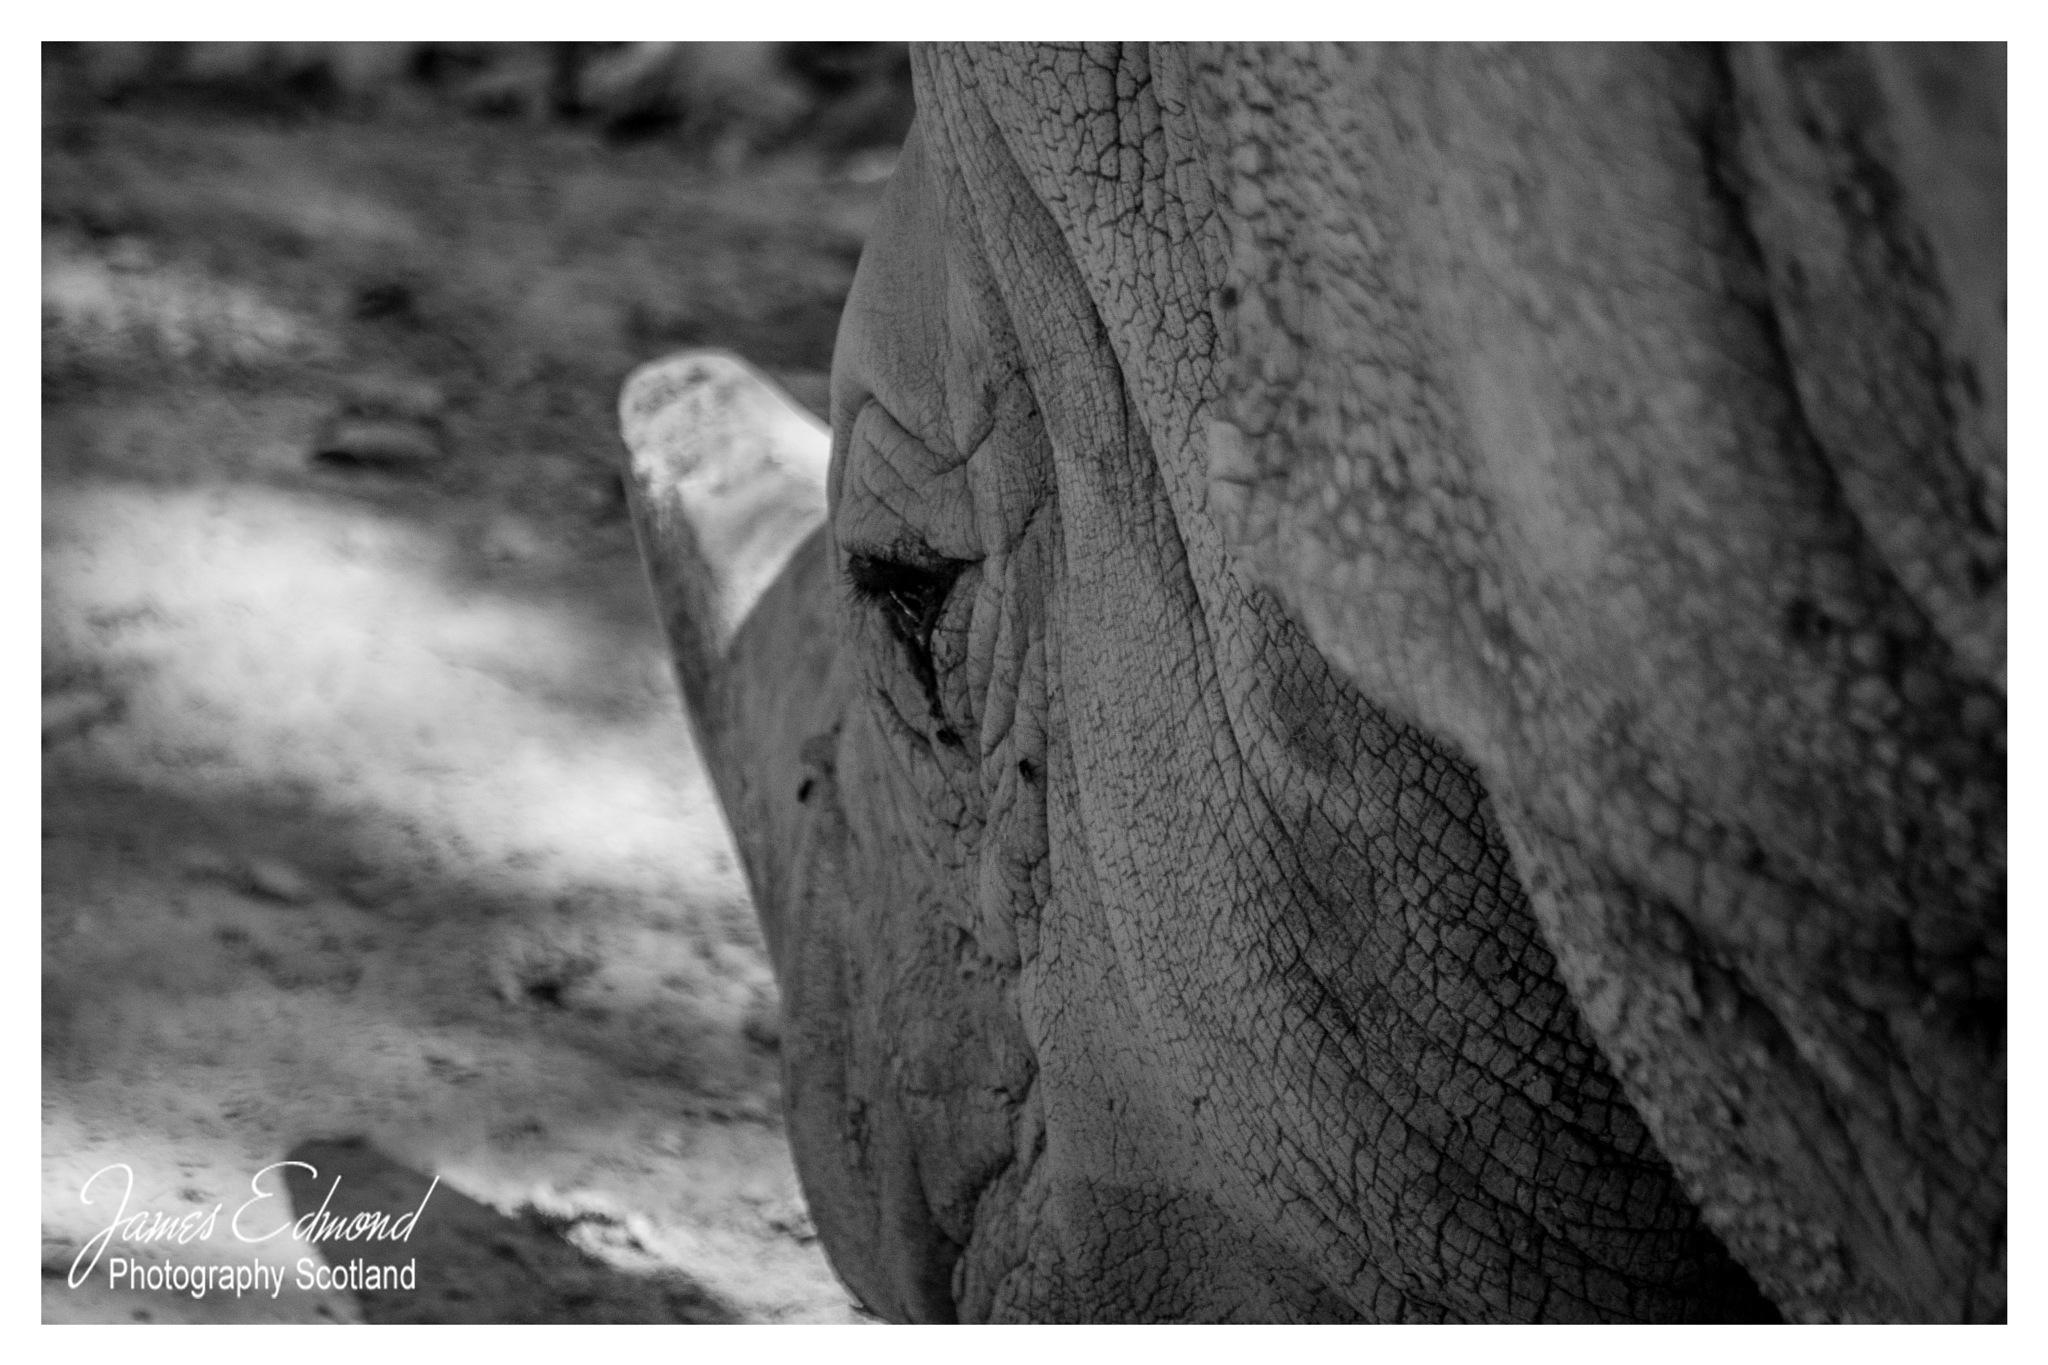 White Rhino by James Edmond Photography